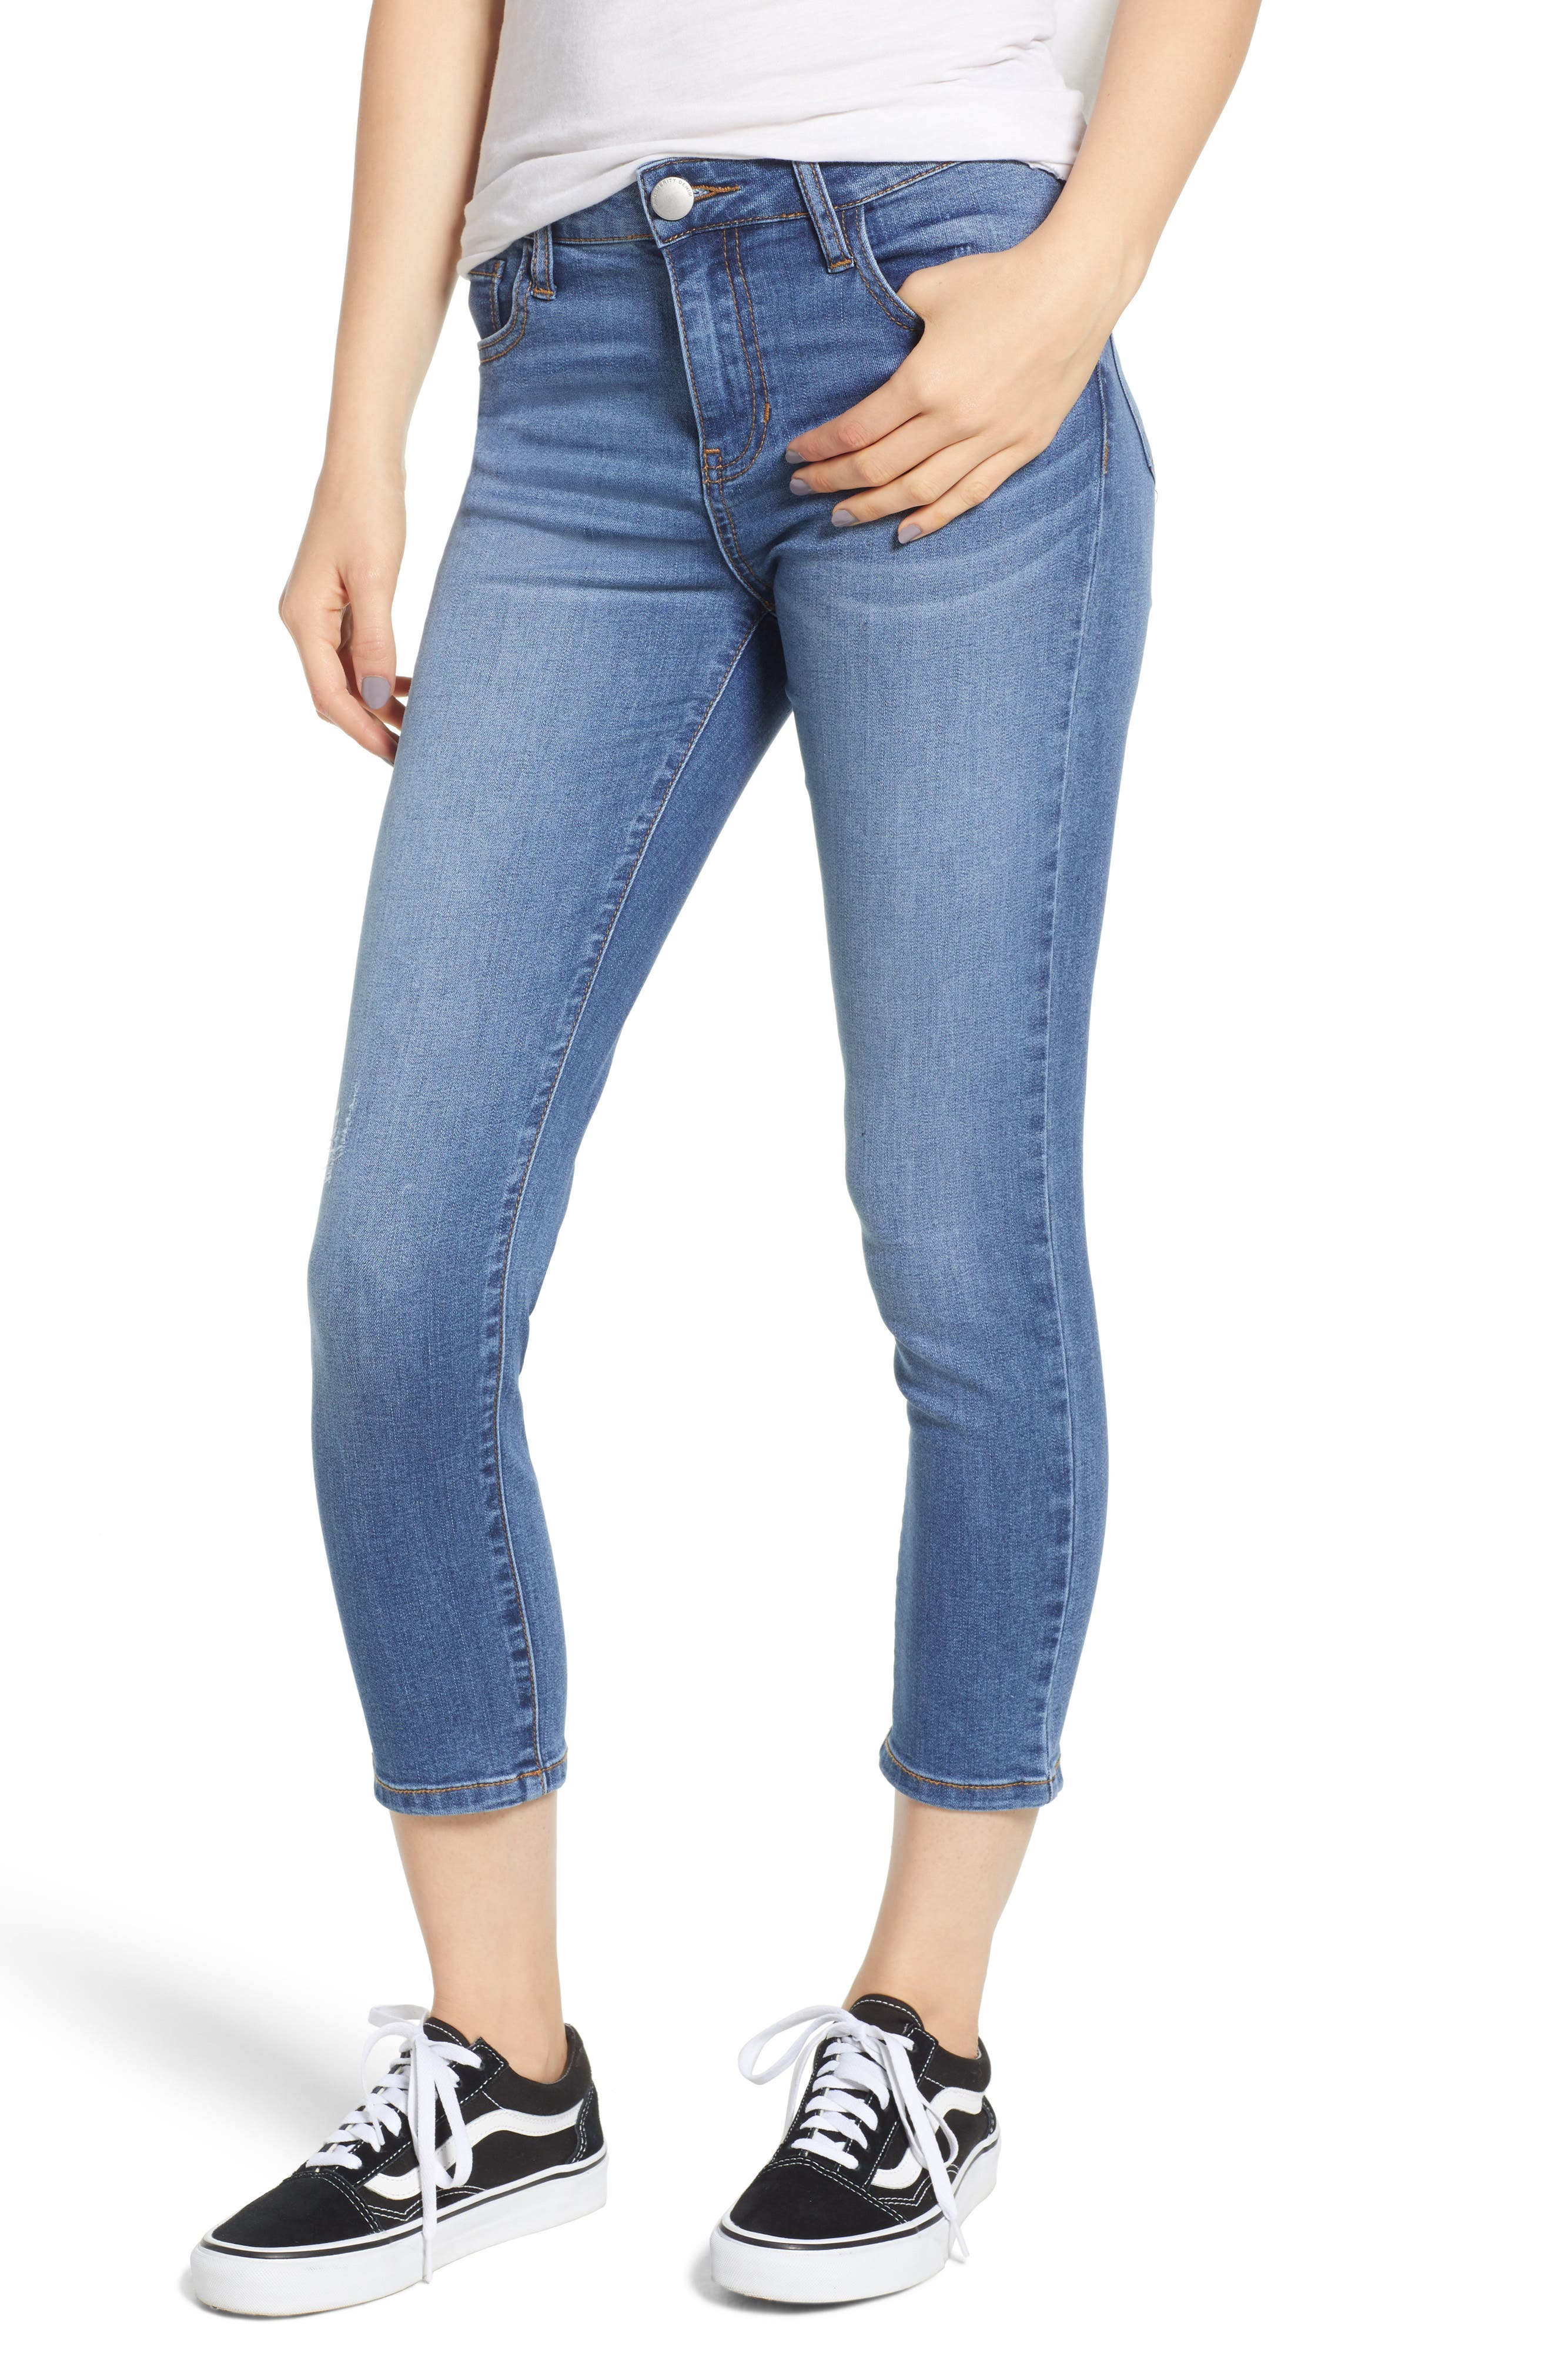 PROSPERITY DENIM Crop Skinny Jeans, Main, color, MEDIUM WASH